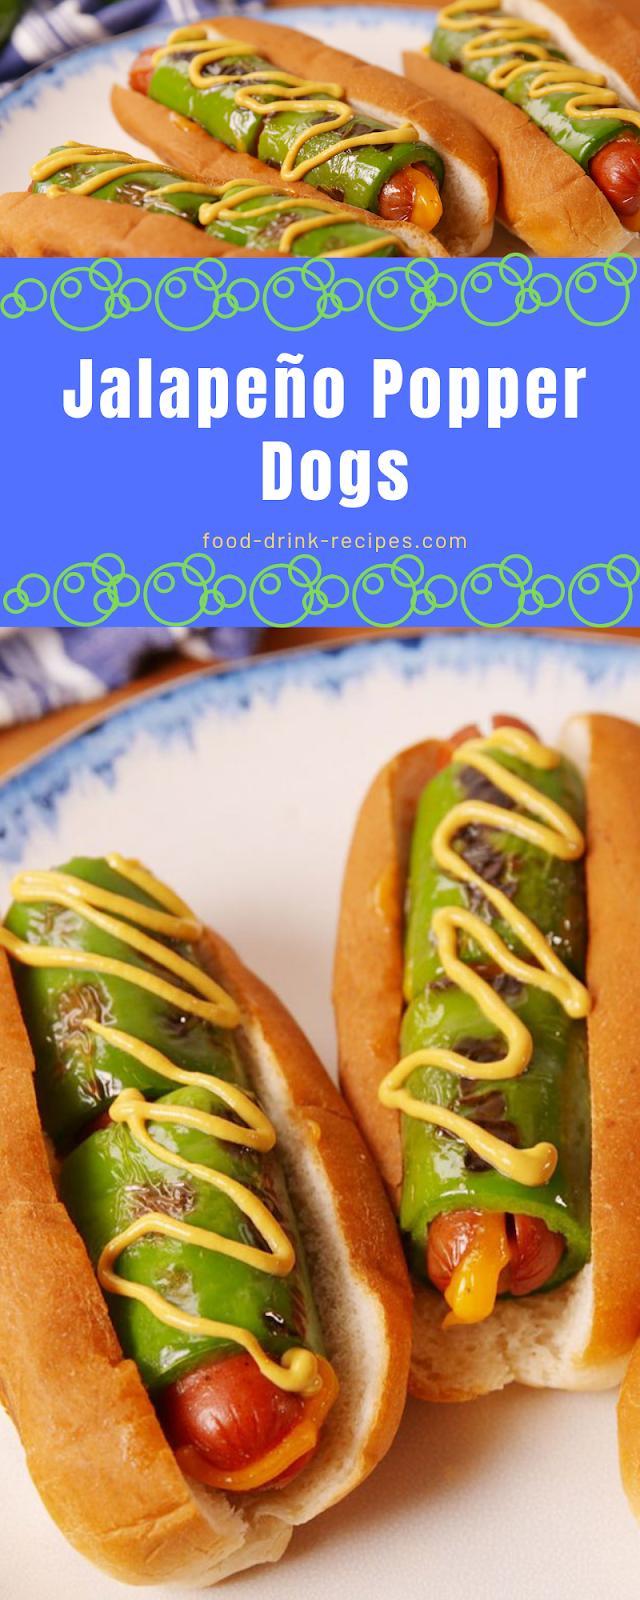 Jalapeño Popper Dogs - food-drink-recipes.com